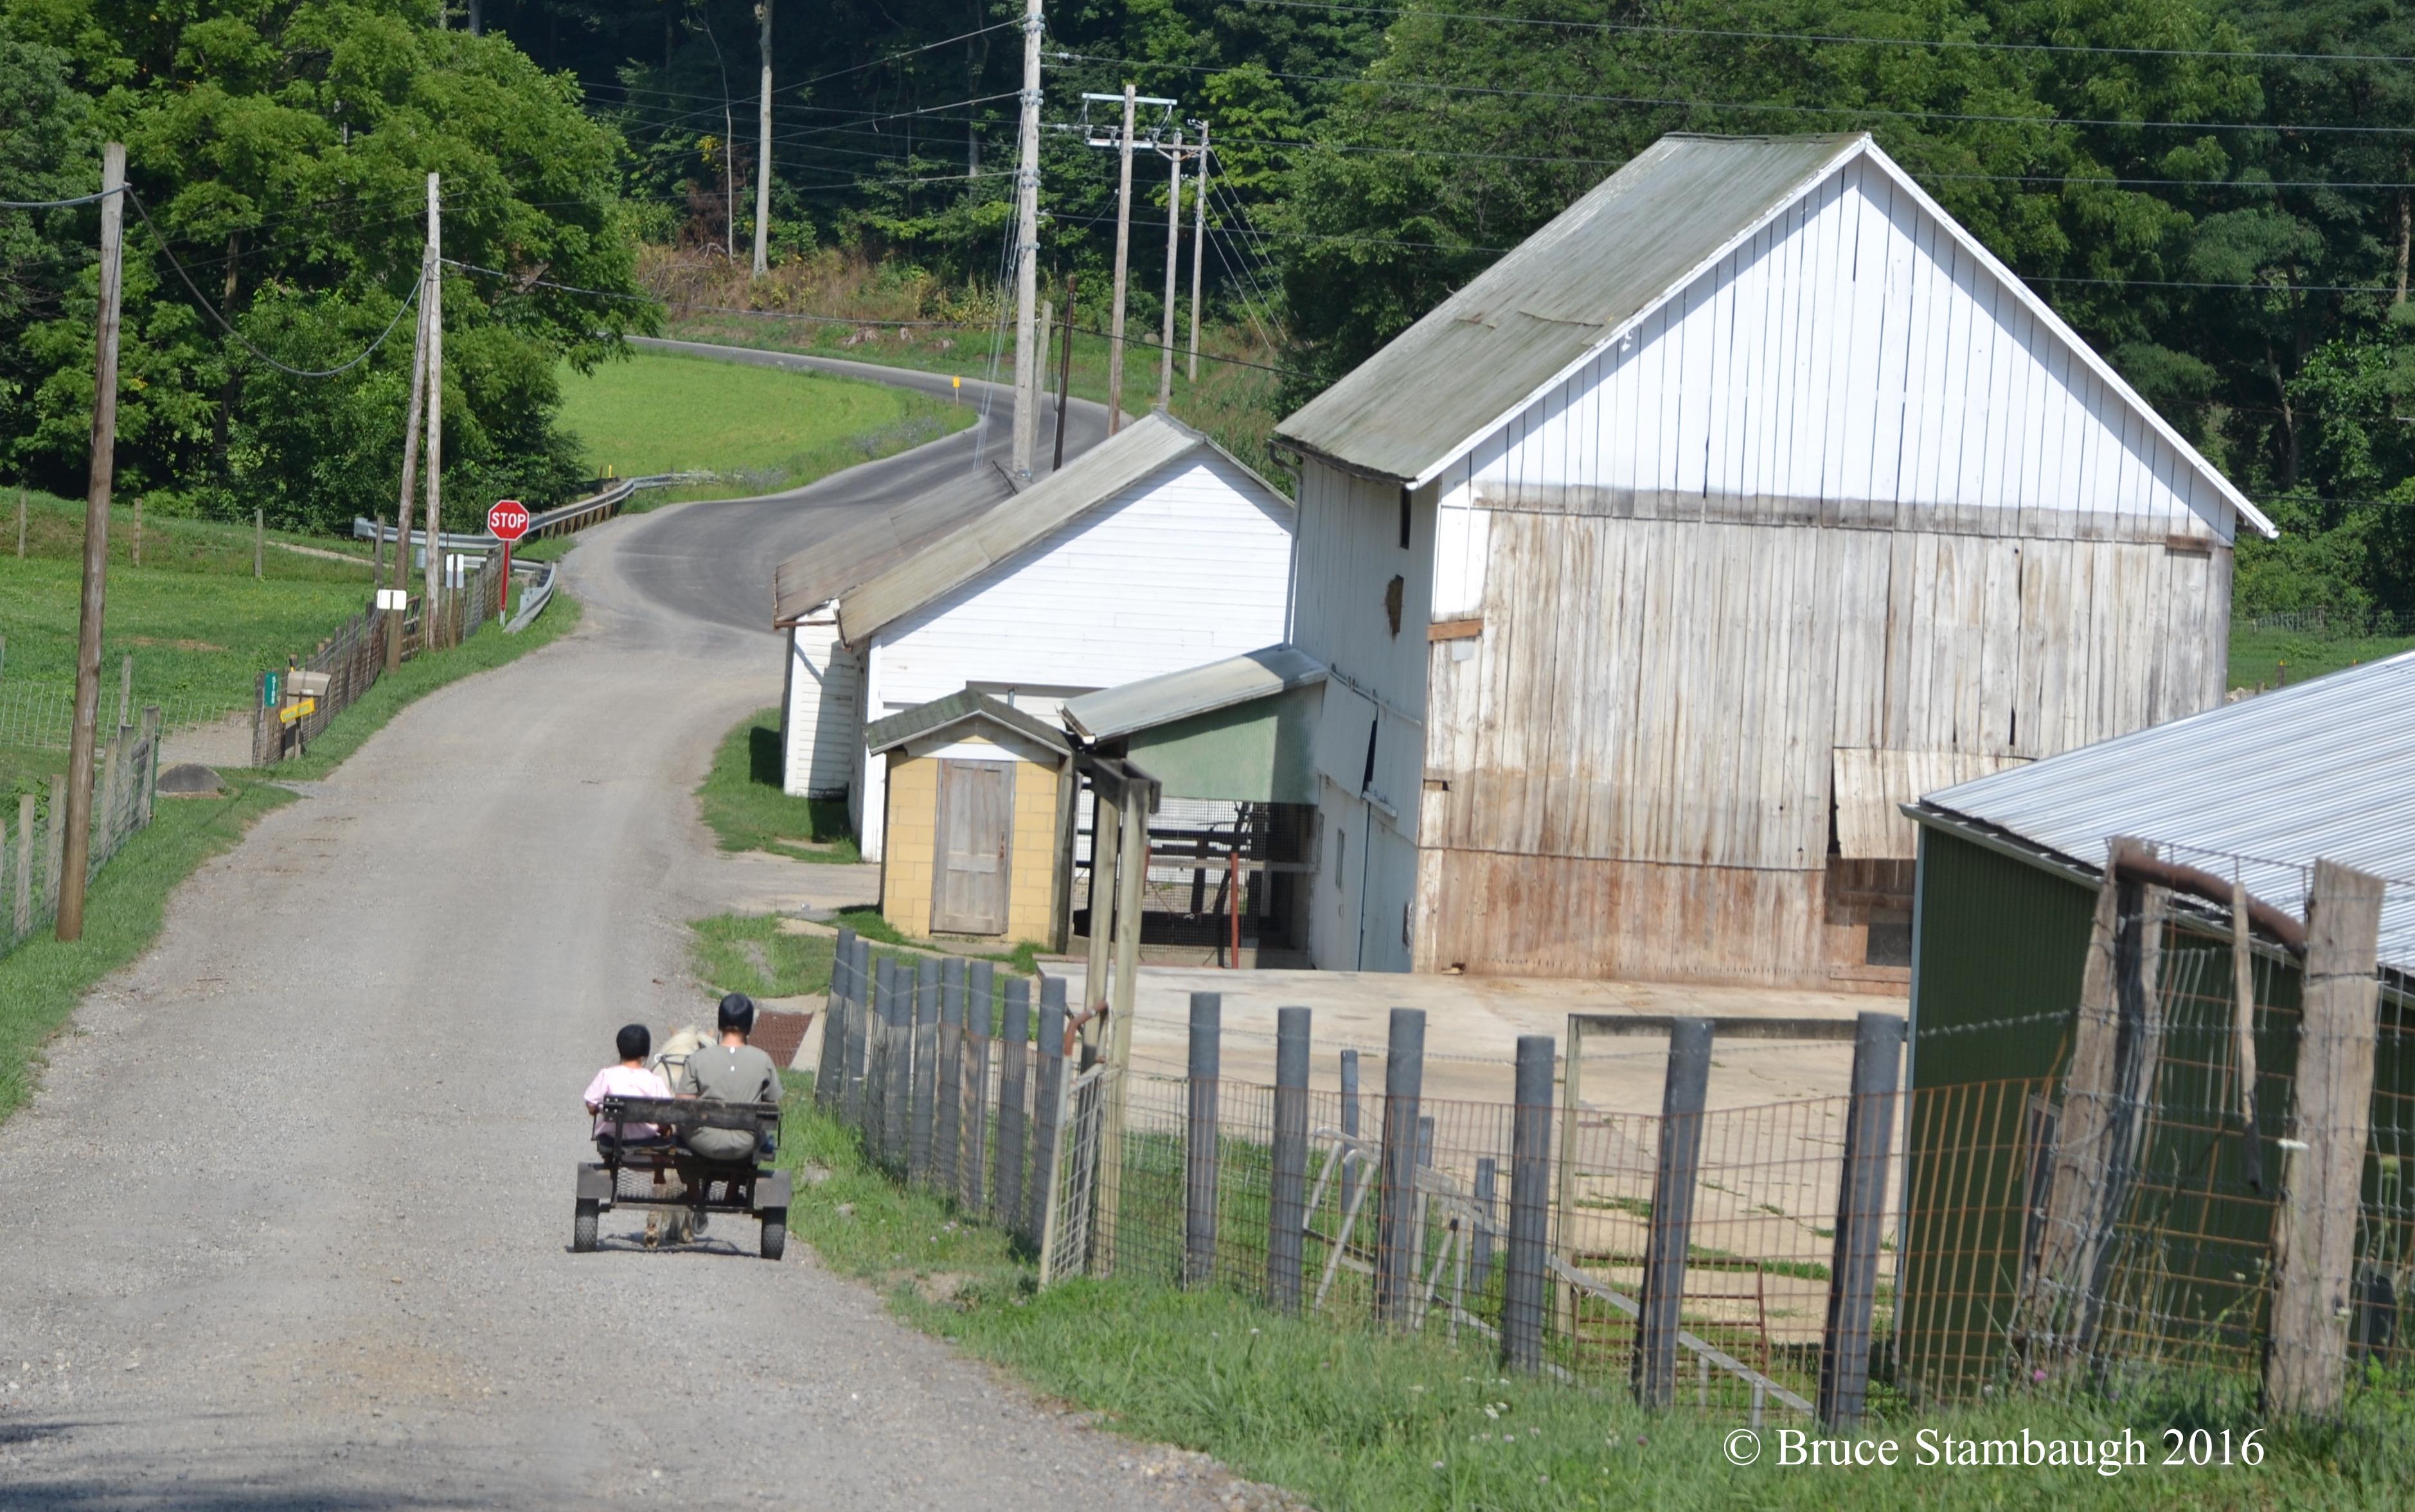 Amish children, pony cart